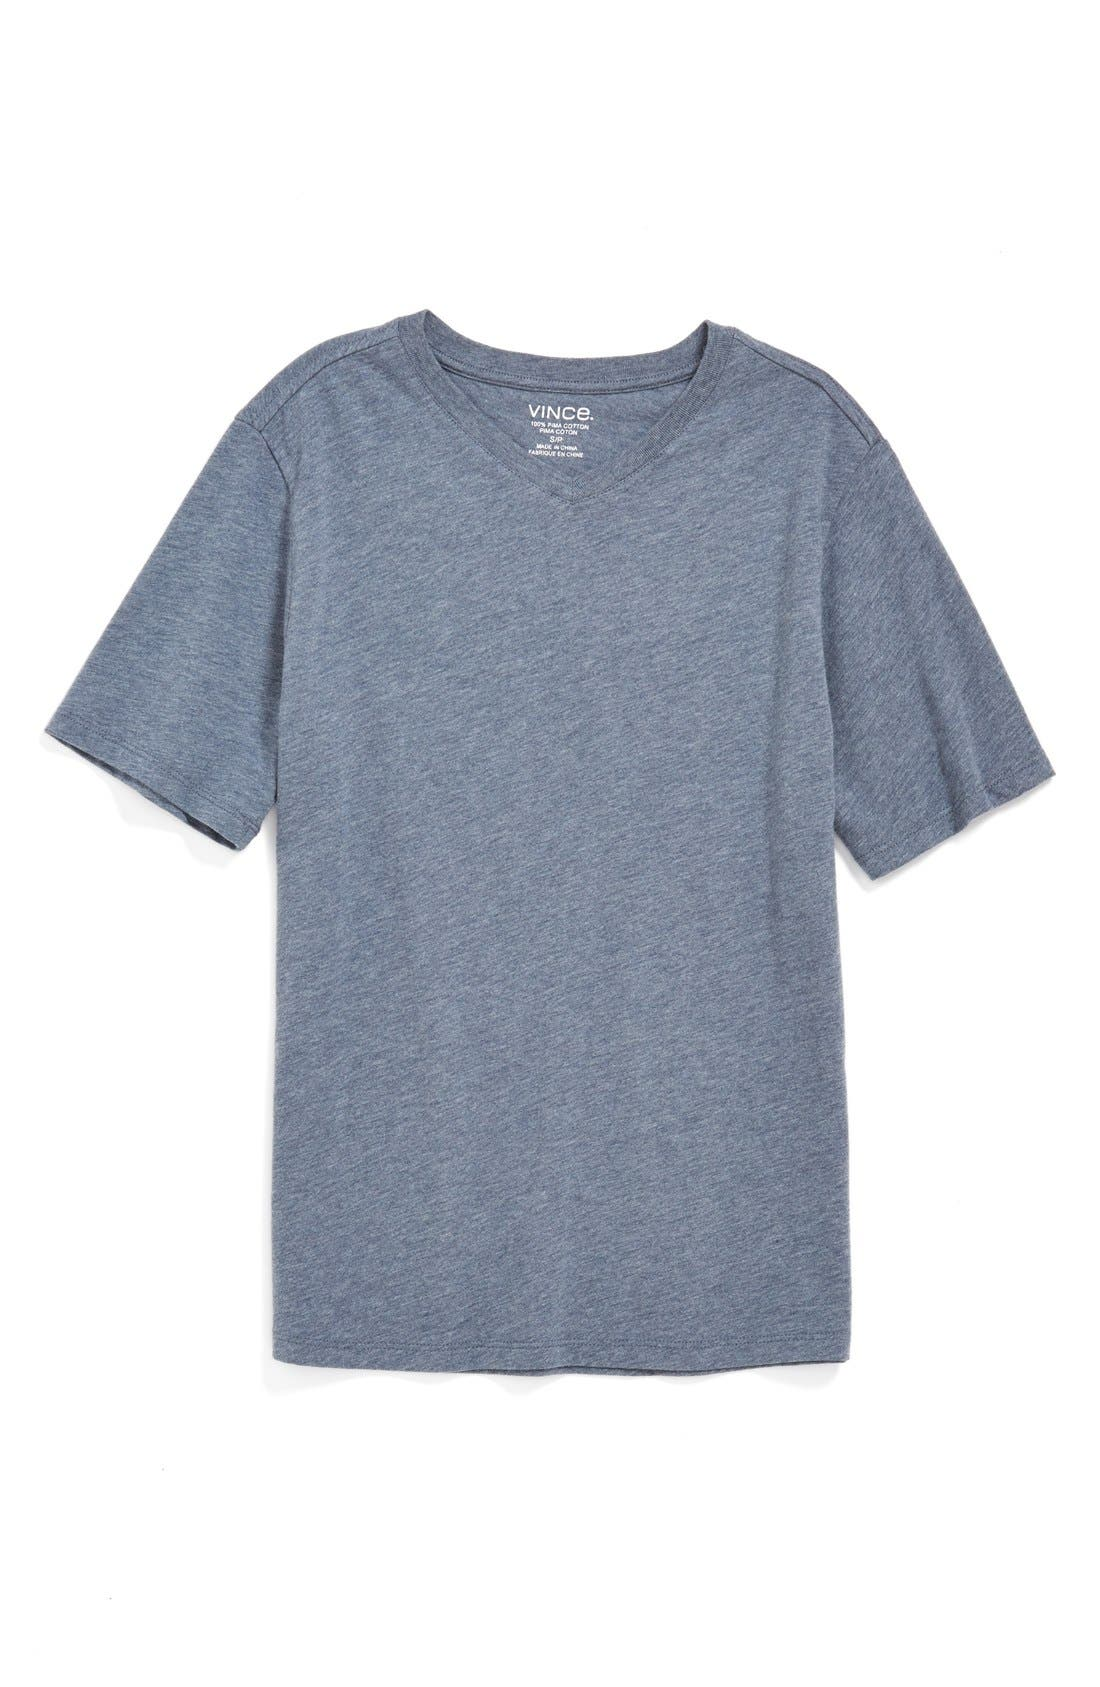 Main Image - Vince 'Favorite' V-Neck T-Shirt (Little Boys)